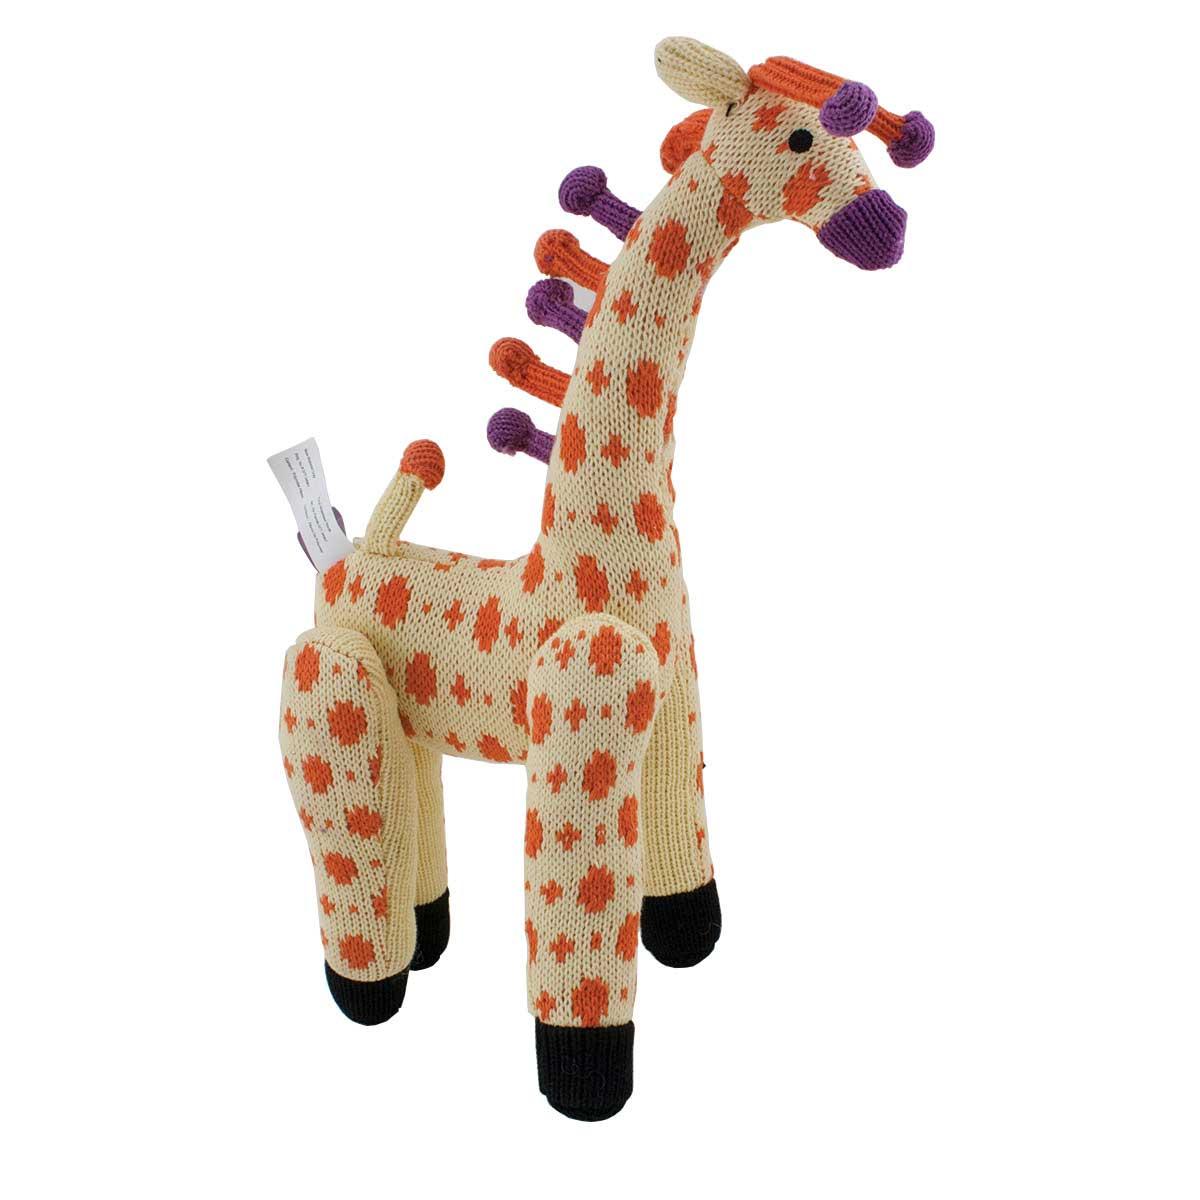 Multipet Knitted Animals Giraffe Dog Toy - 13 inch